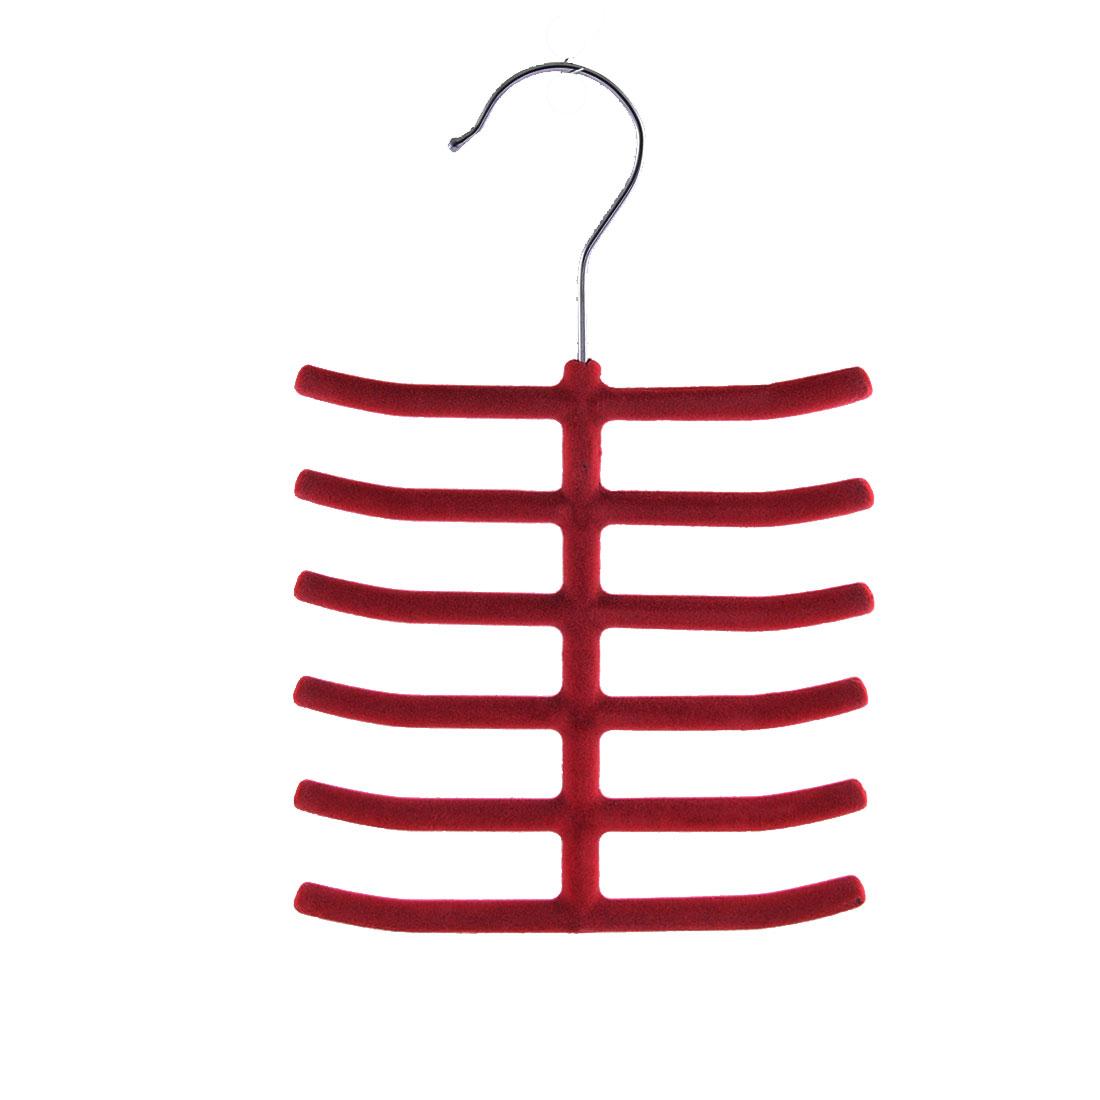 Household Bedroom Fishbone Shaped Towel Belt Shawl Scarf Necktie Rack Holder Red